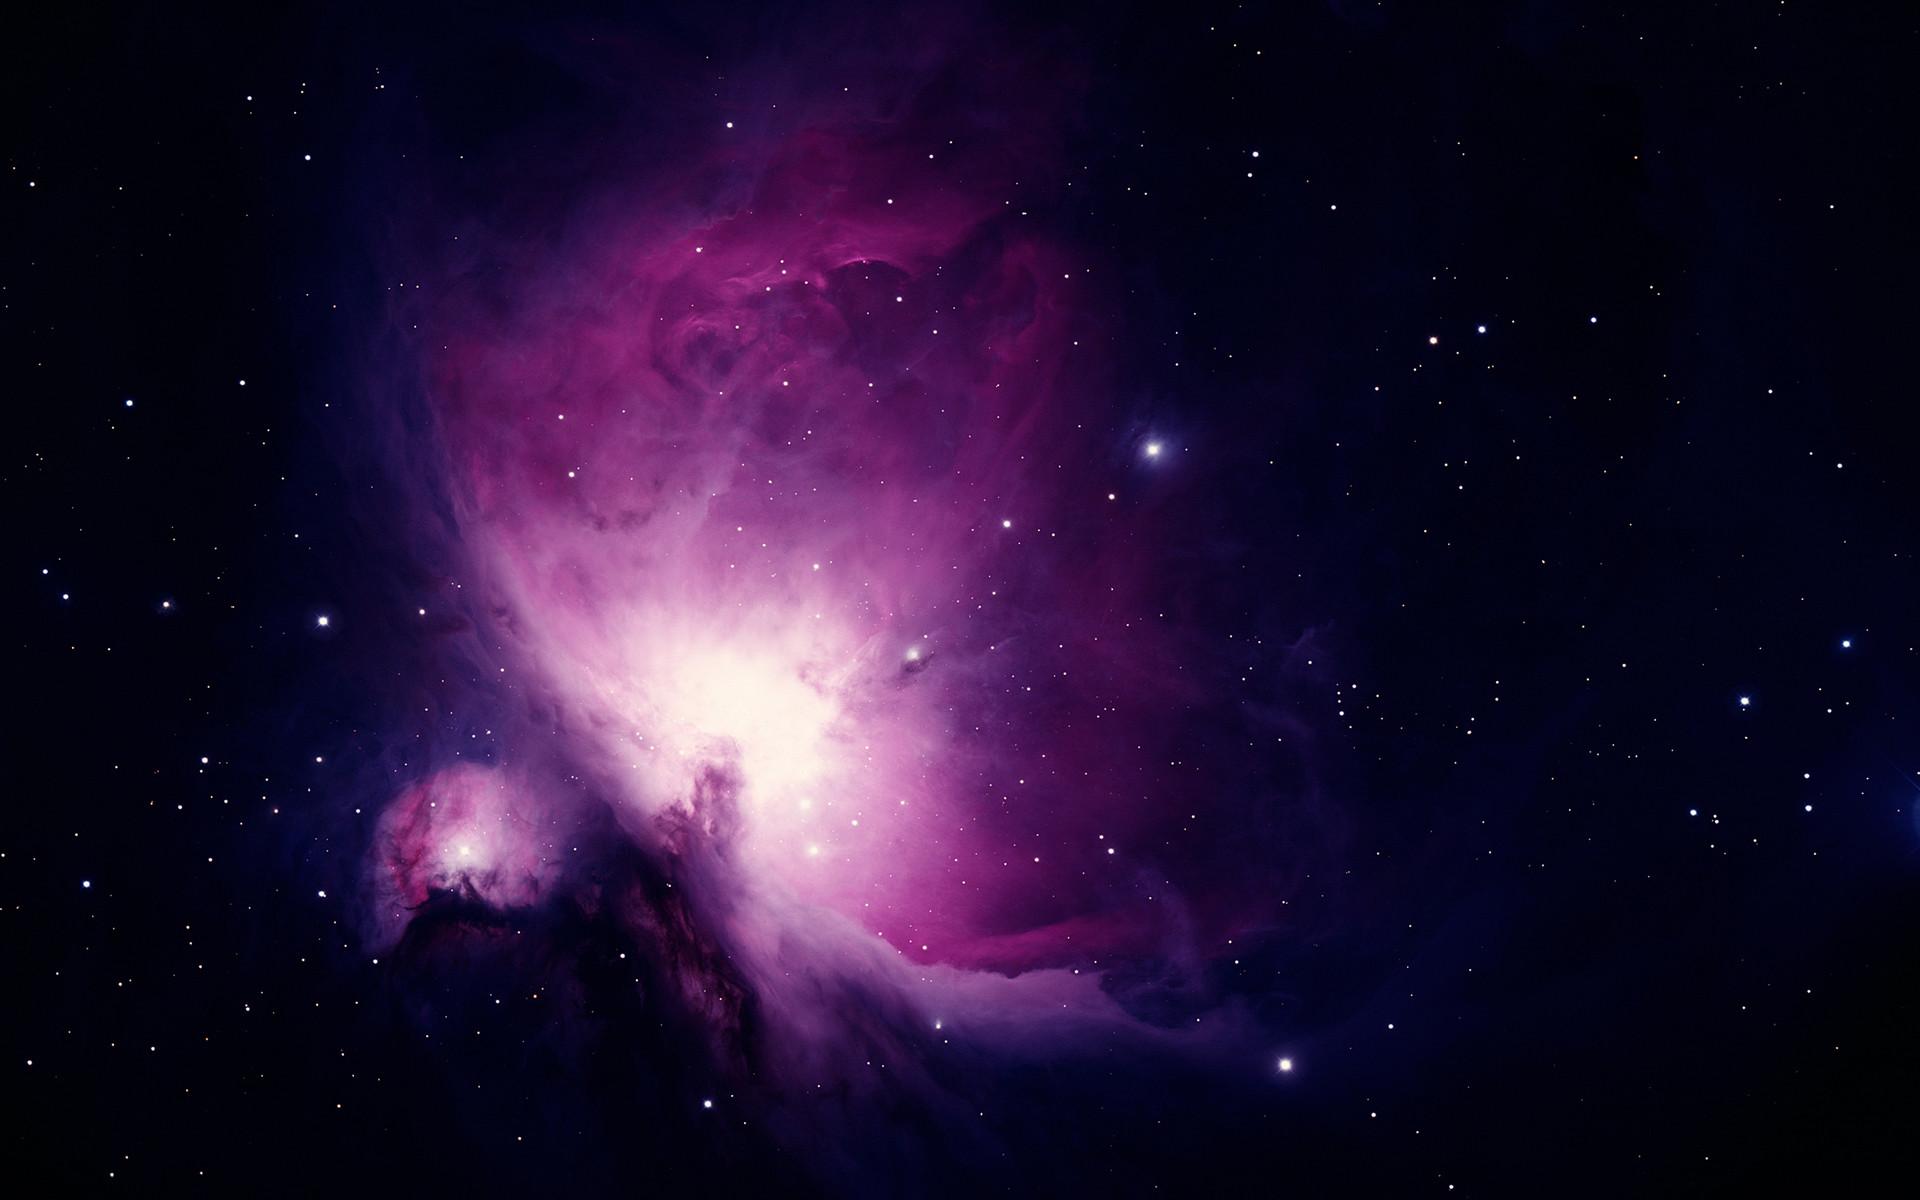 colorful-galaxy-wallpaper-hd-4